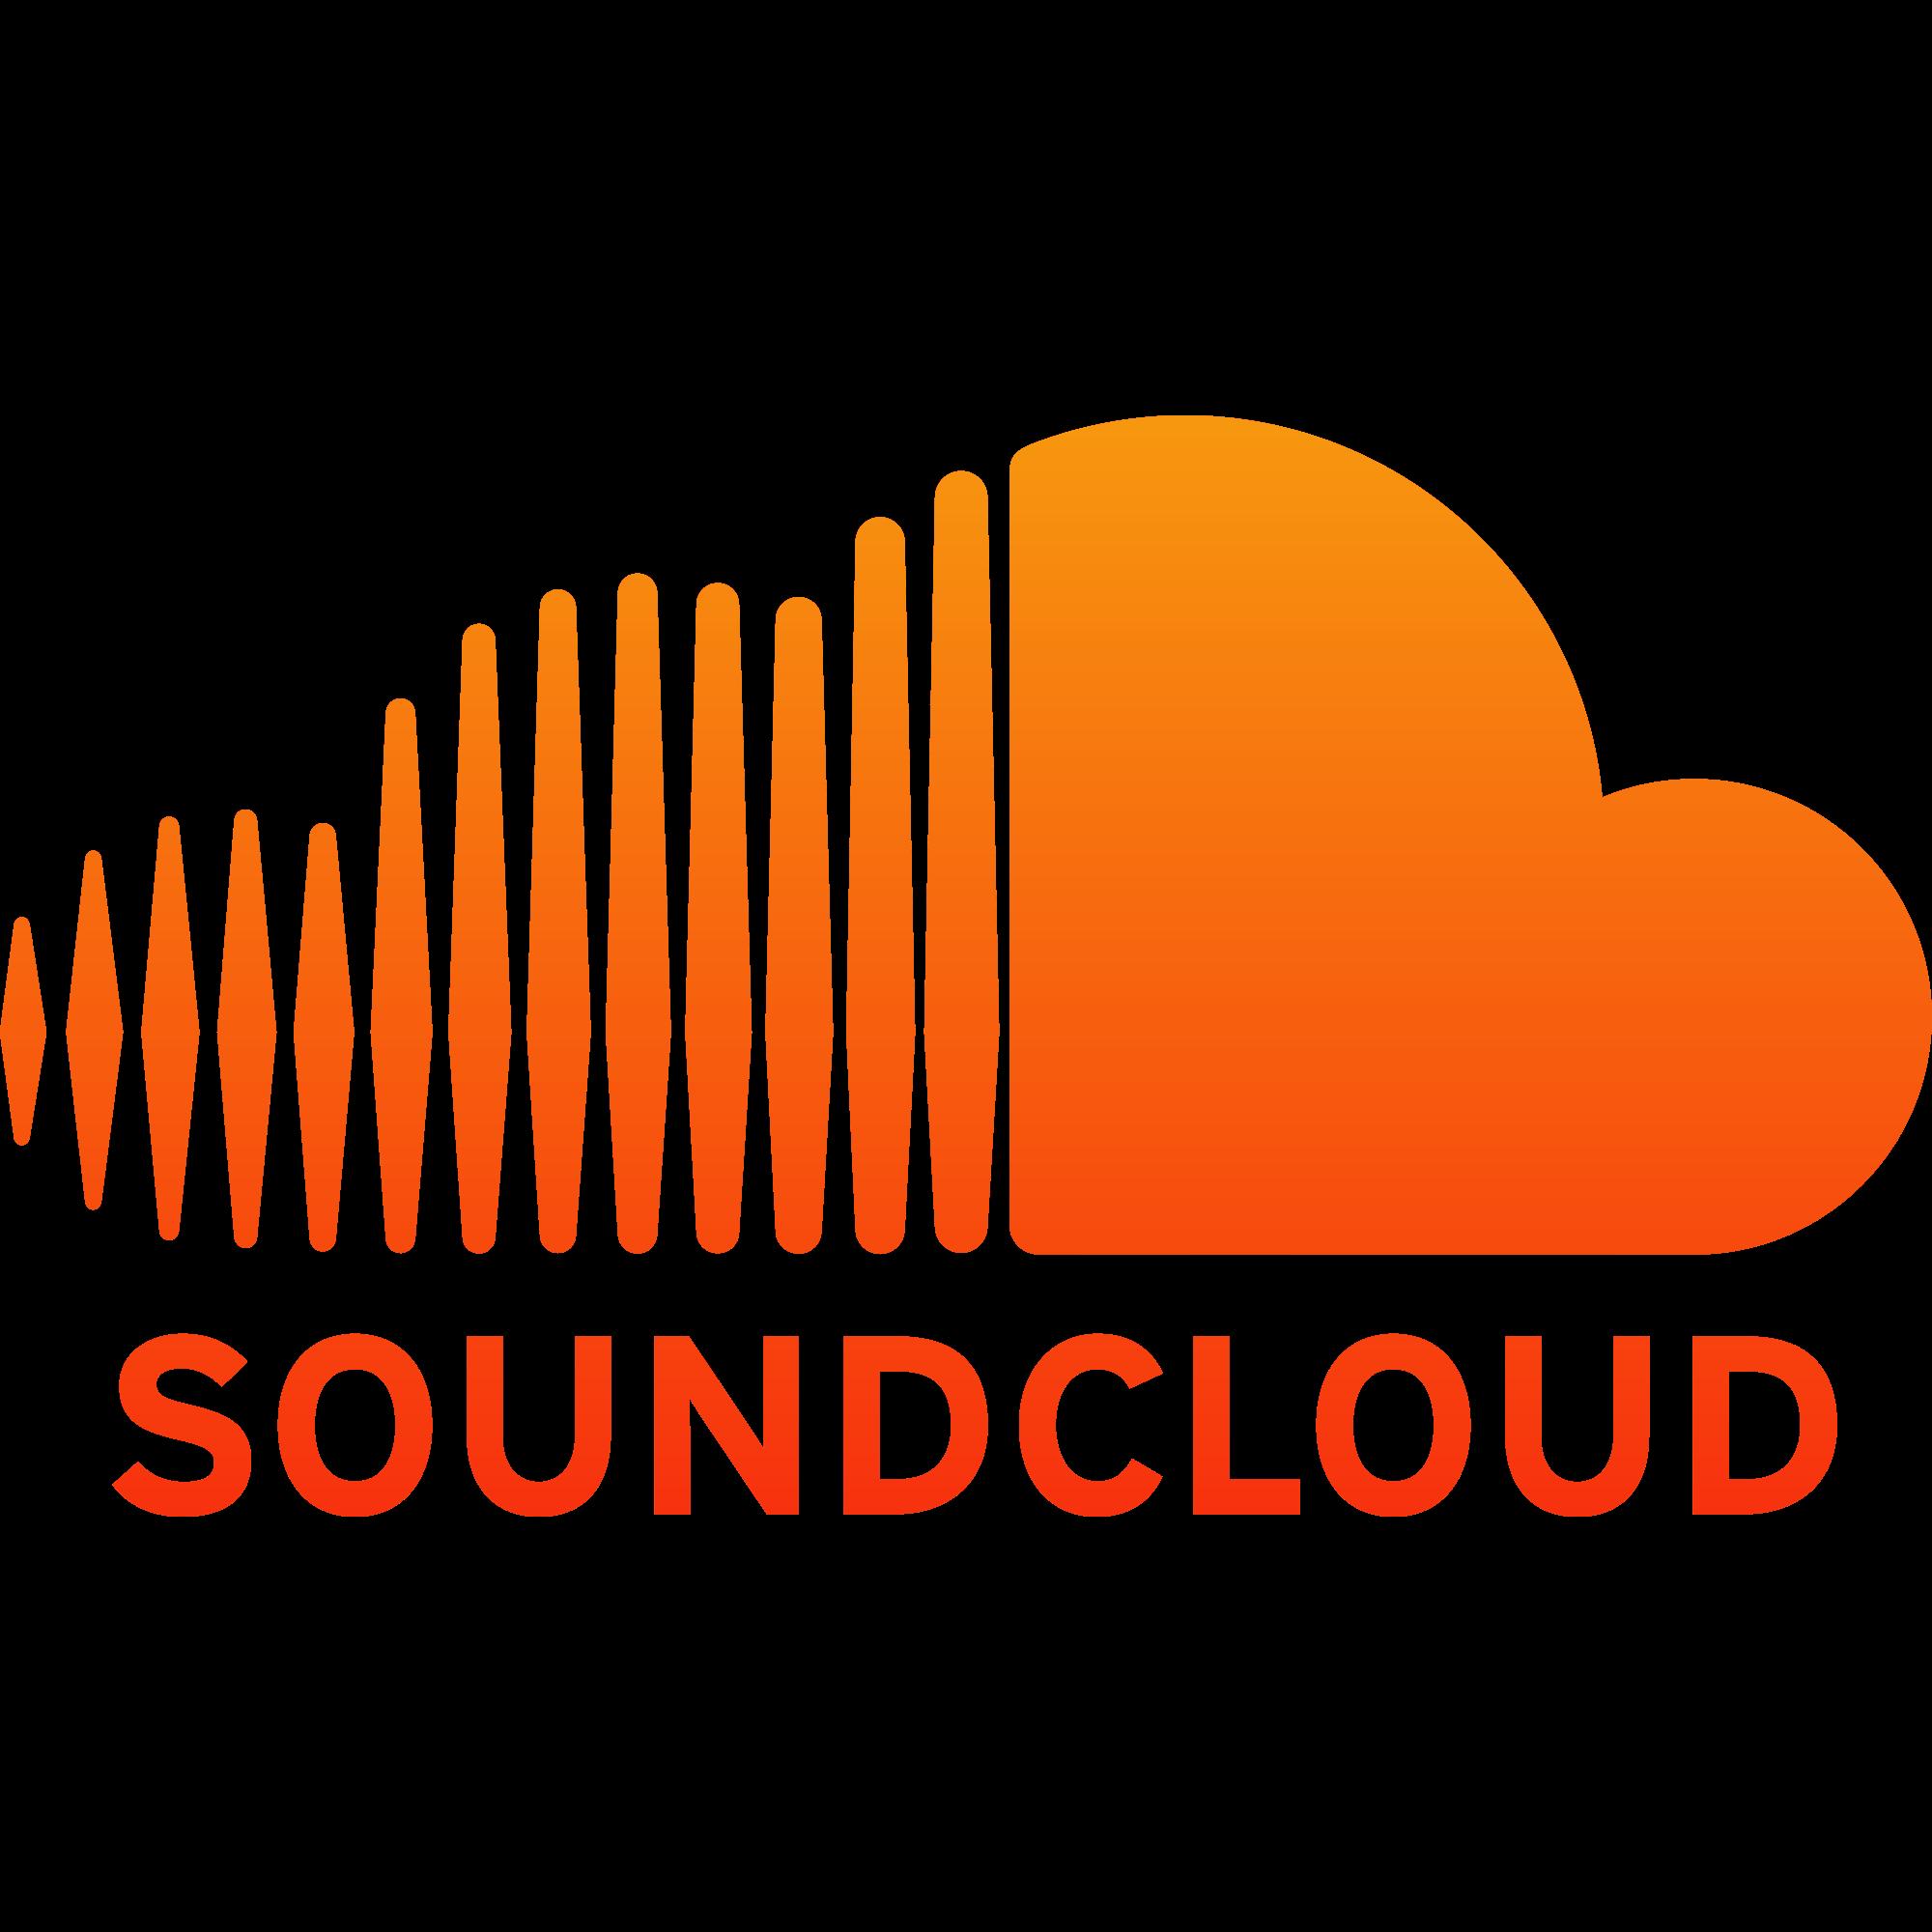 Saucy - Ayo Soundcloud Link Thumbnail | Linktree